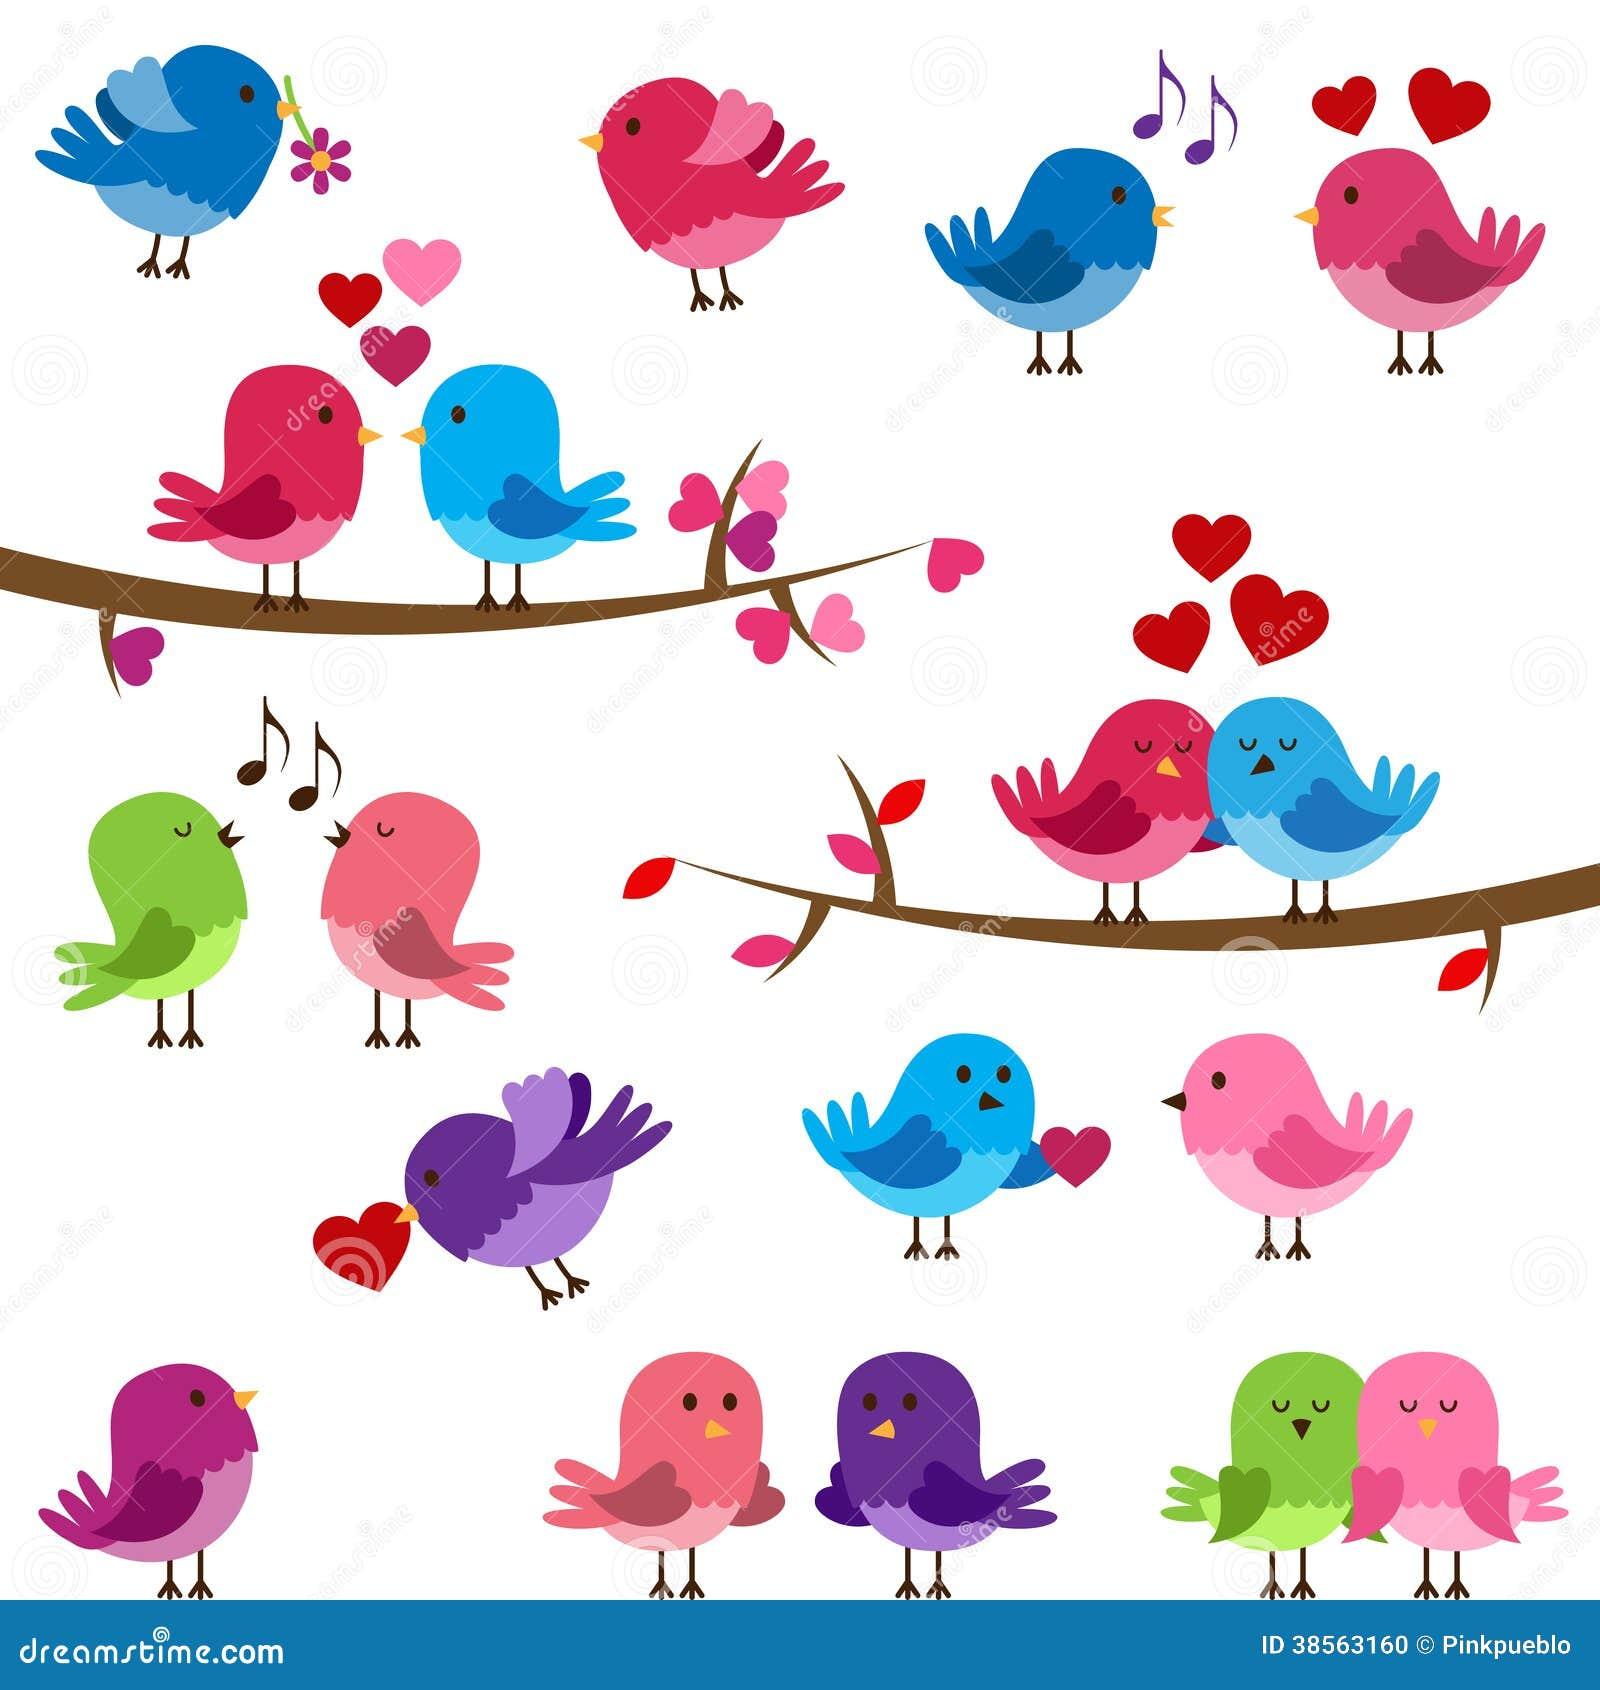 Vector Collection of Cute Love Birds